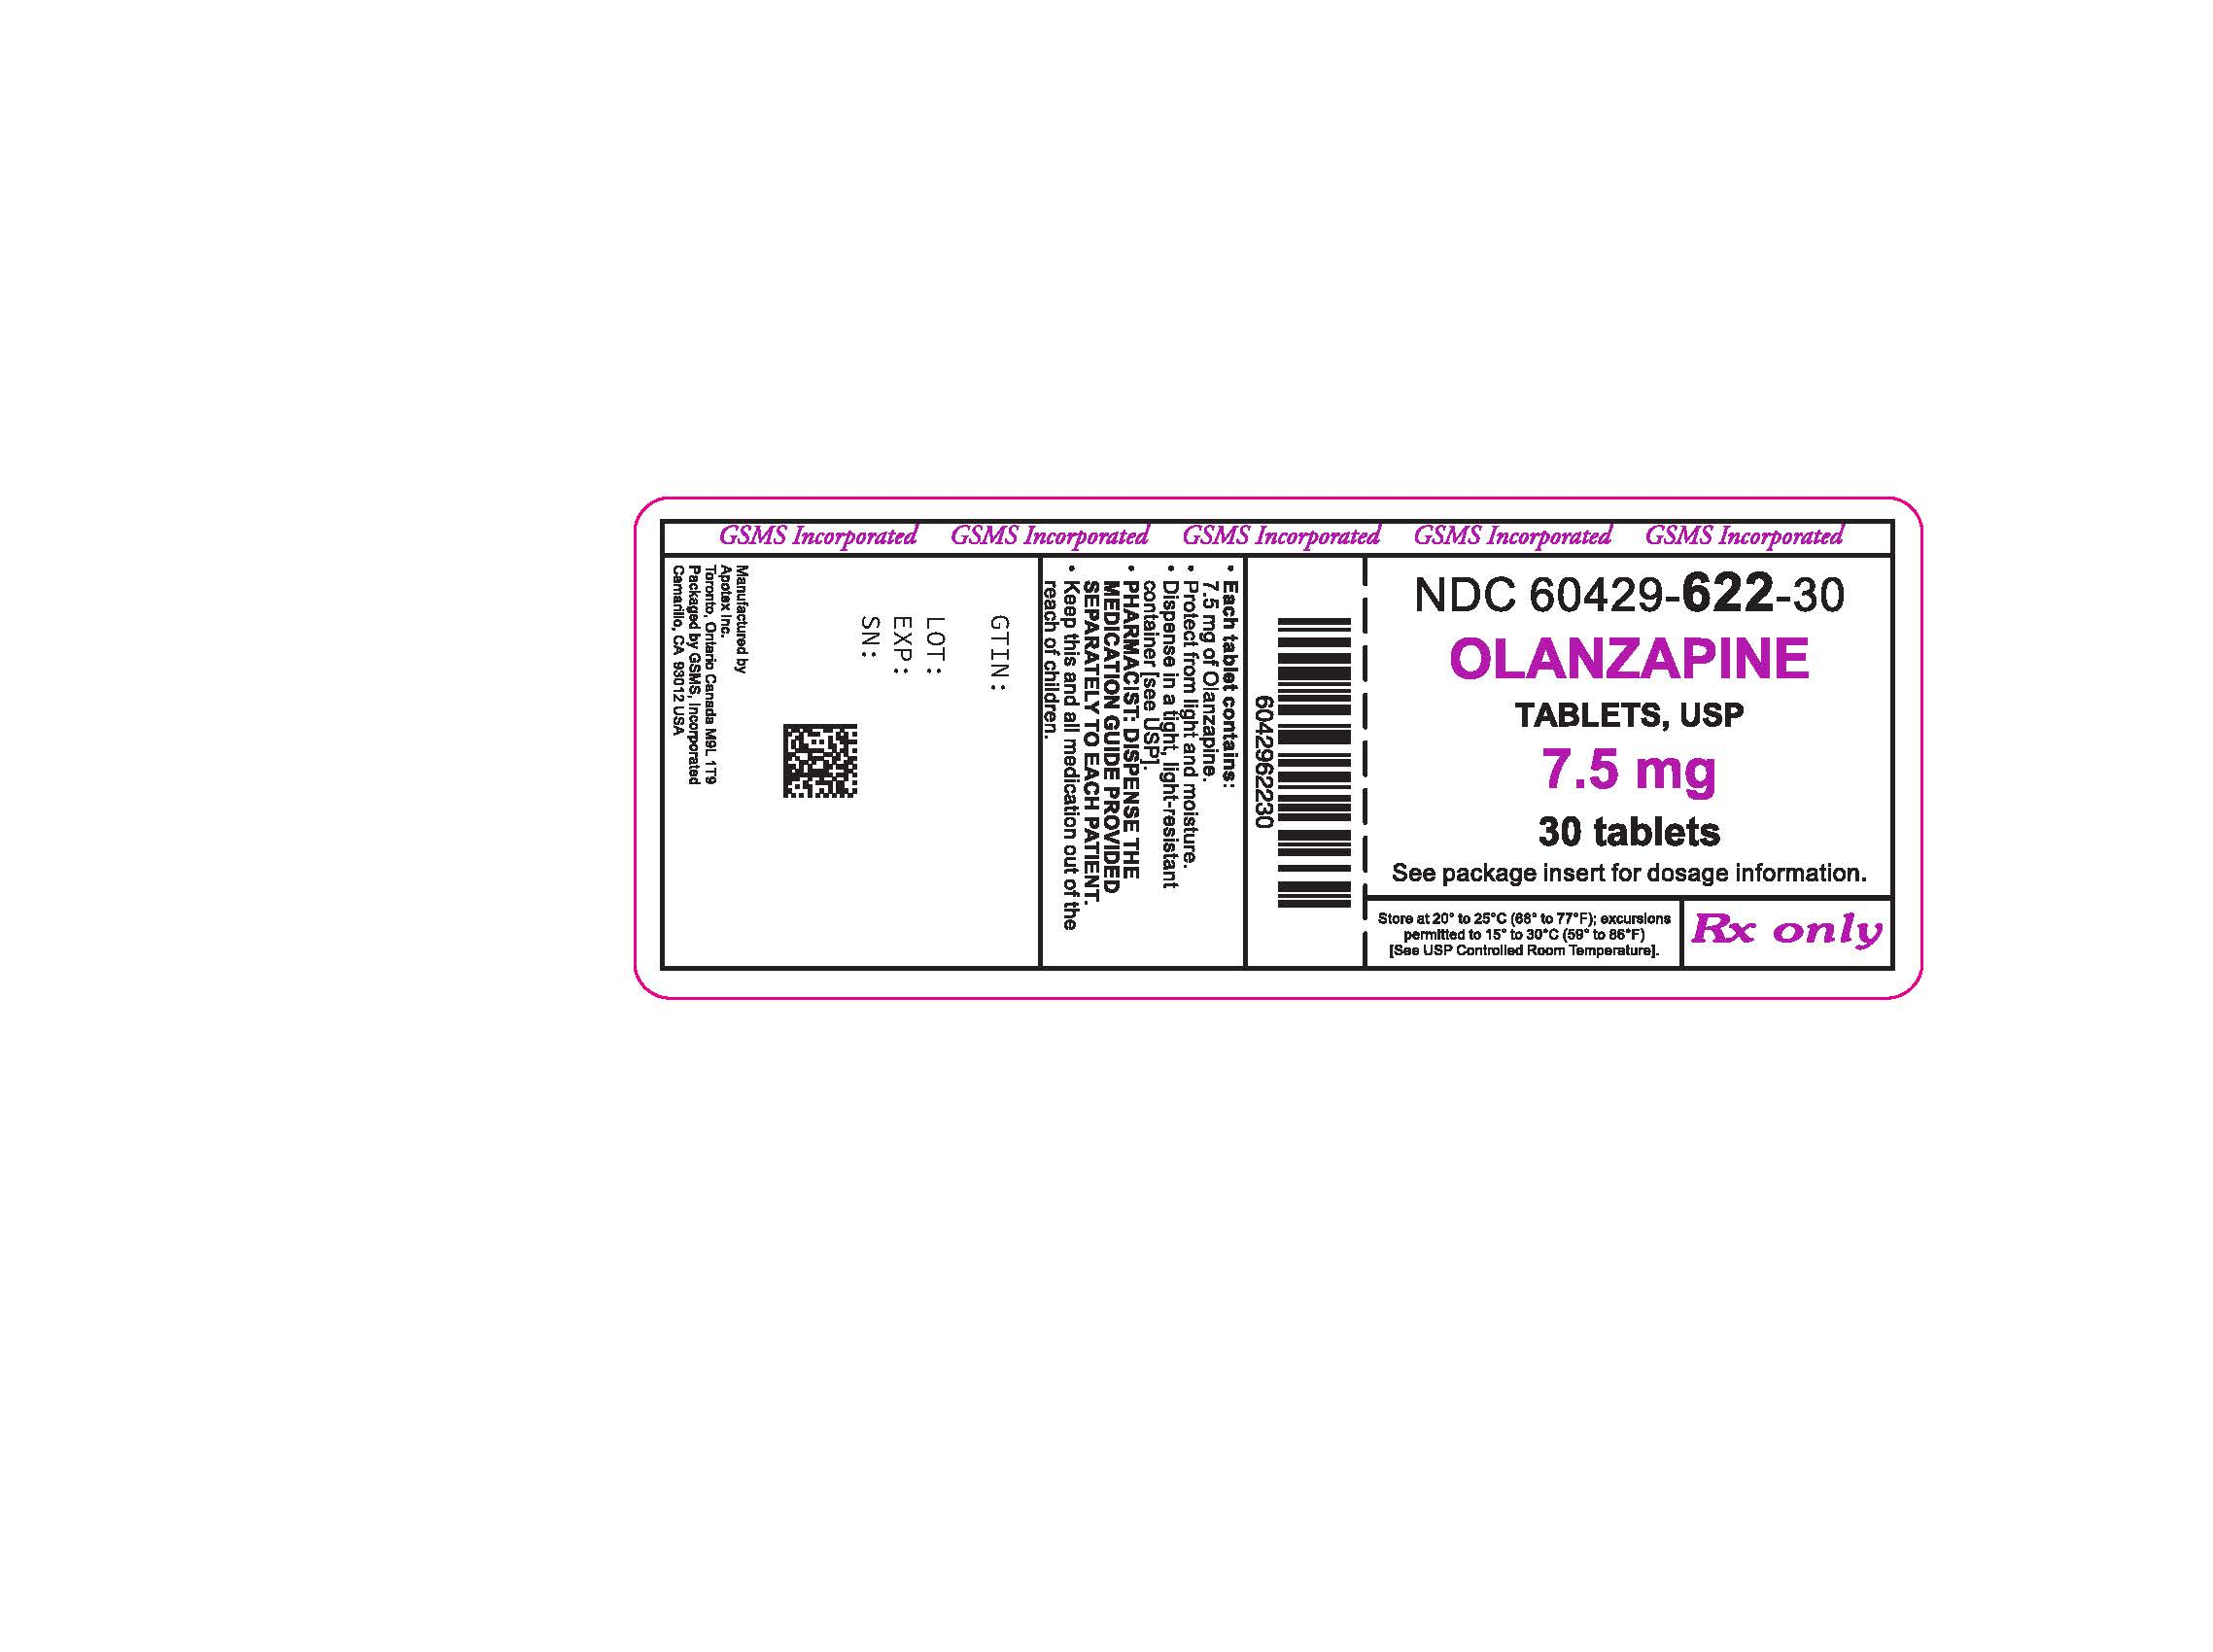 60429-622-30LB OLANZAPINE 7.5MG TABS.jpg